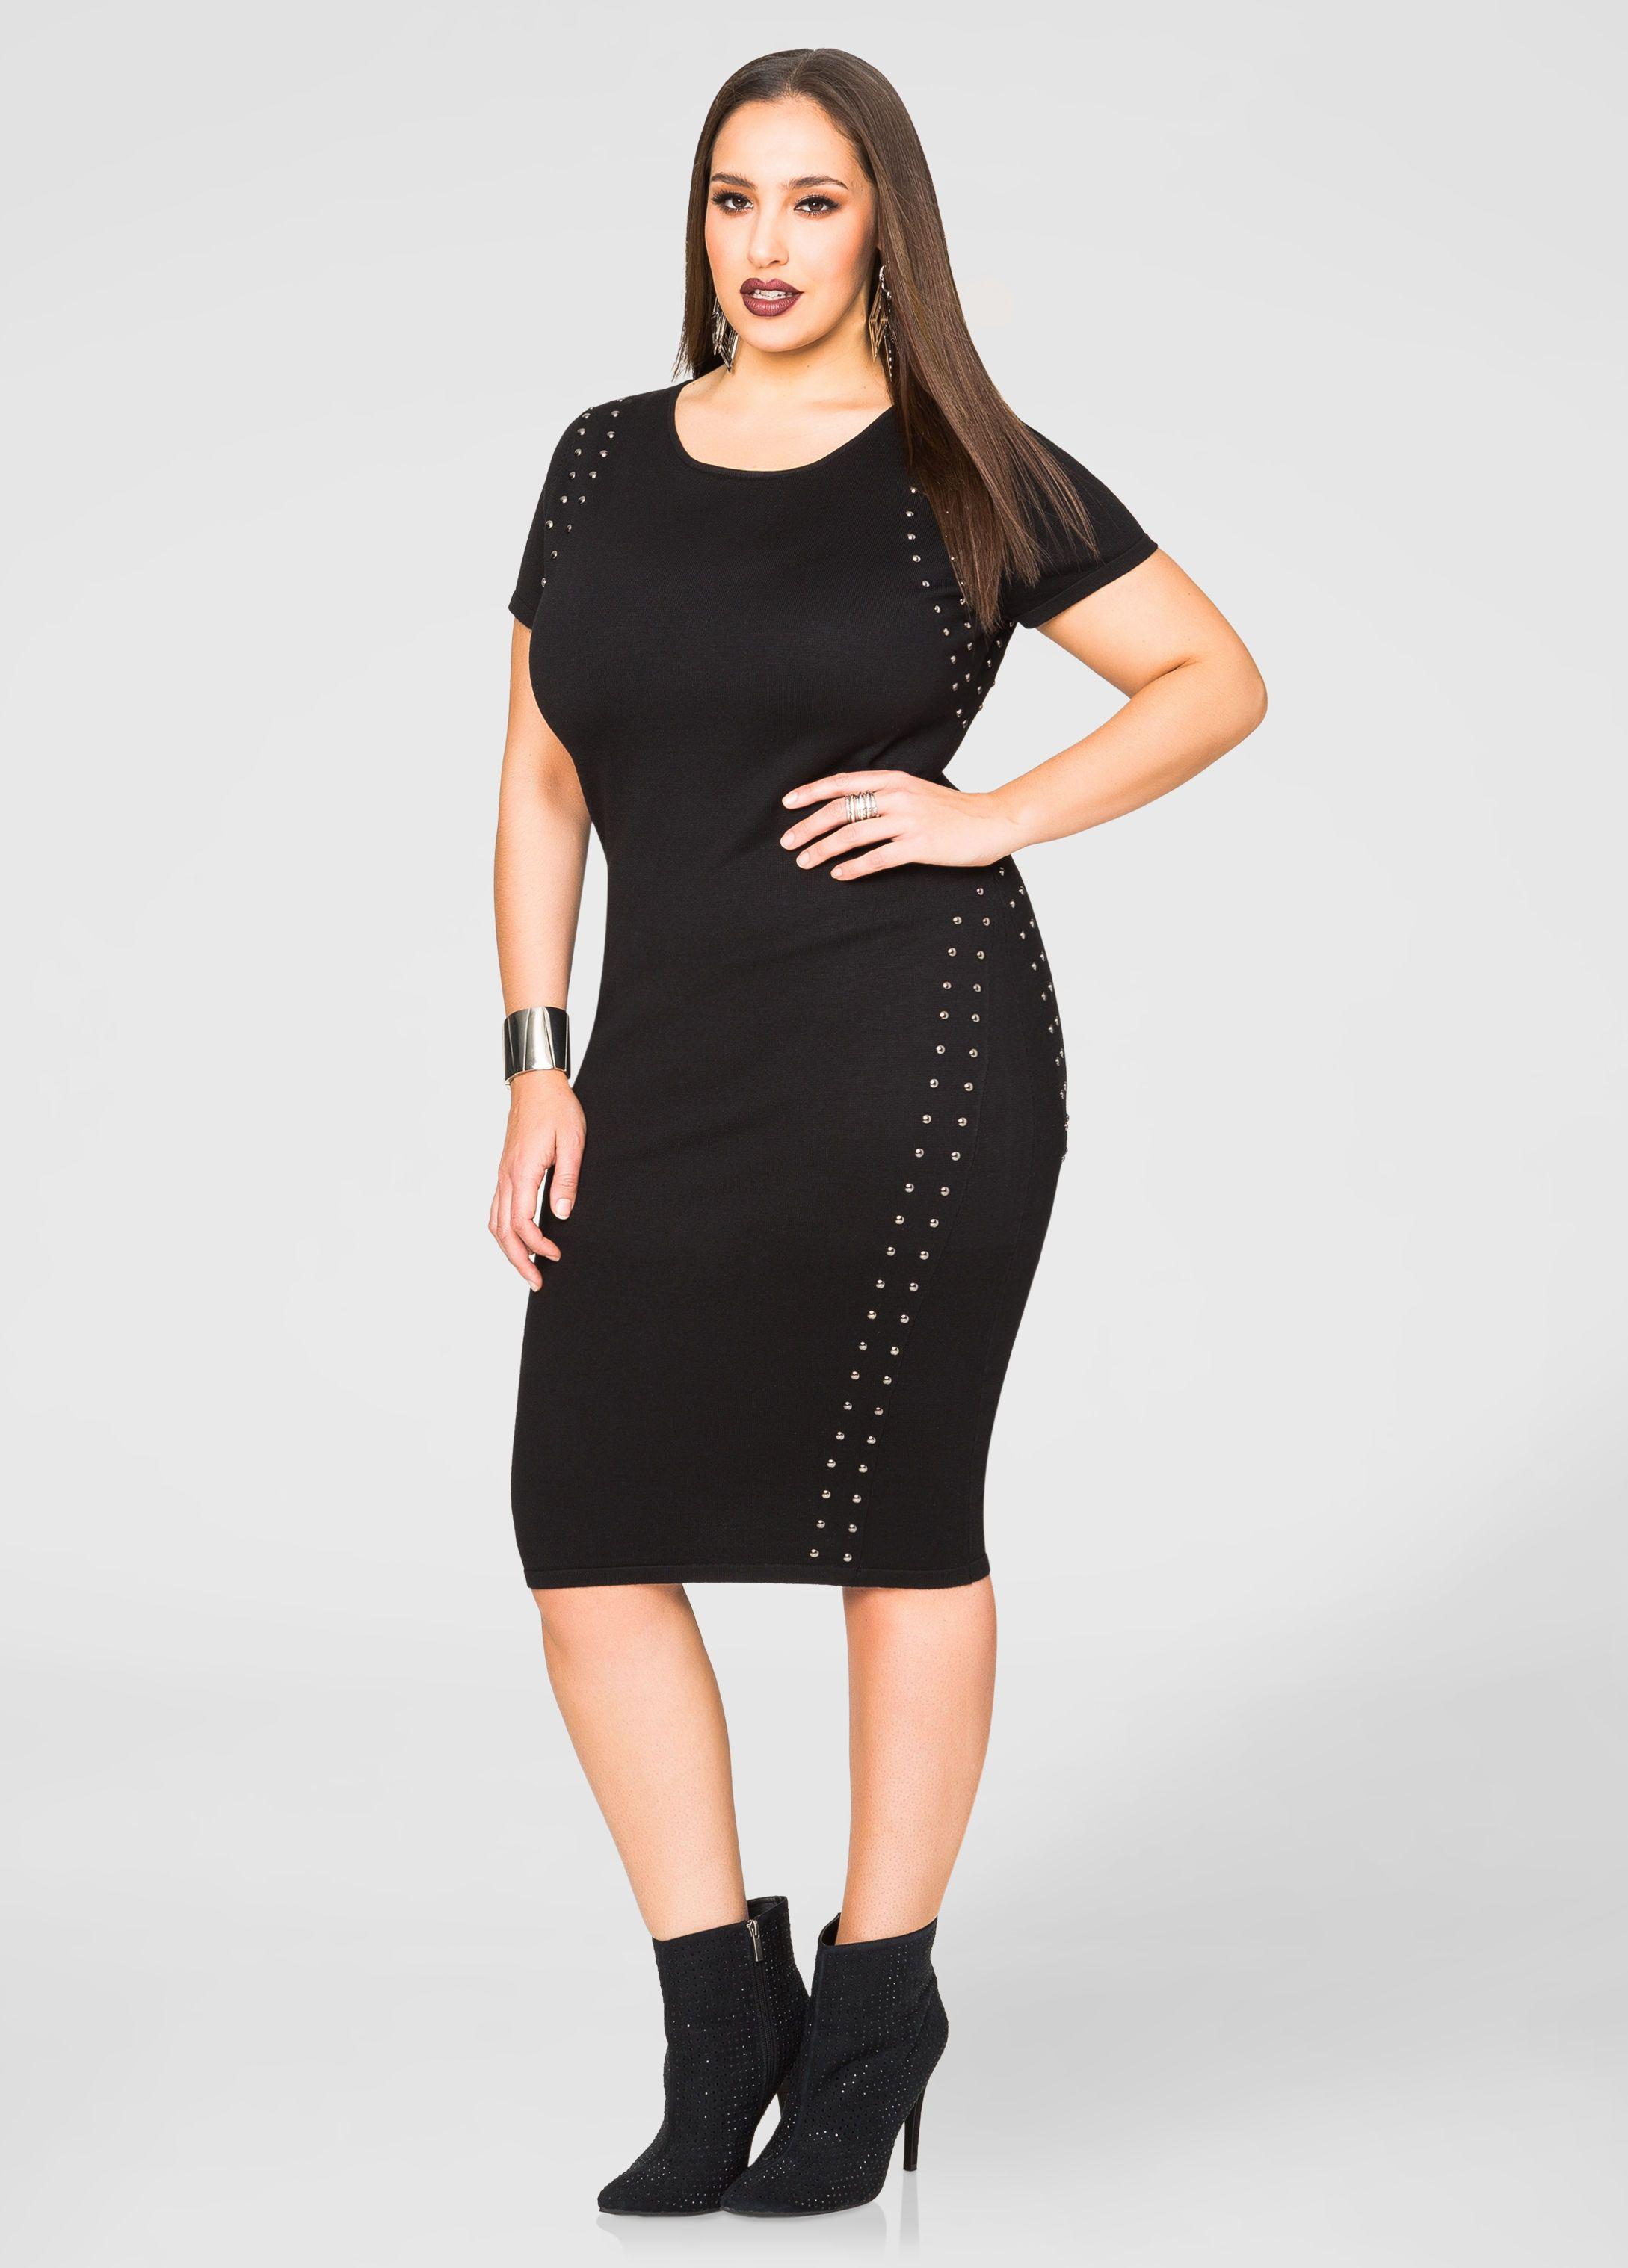 ccd0db135b5 Cap Sleeve Studded Sweater Dress - Ashley Stewart